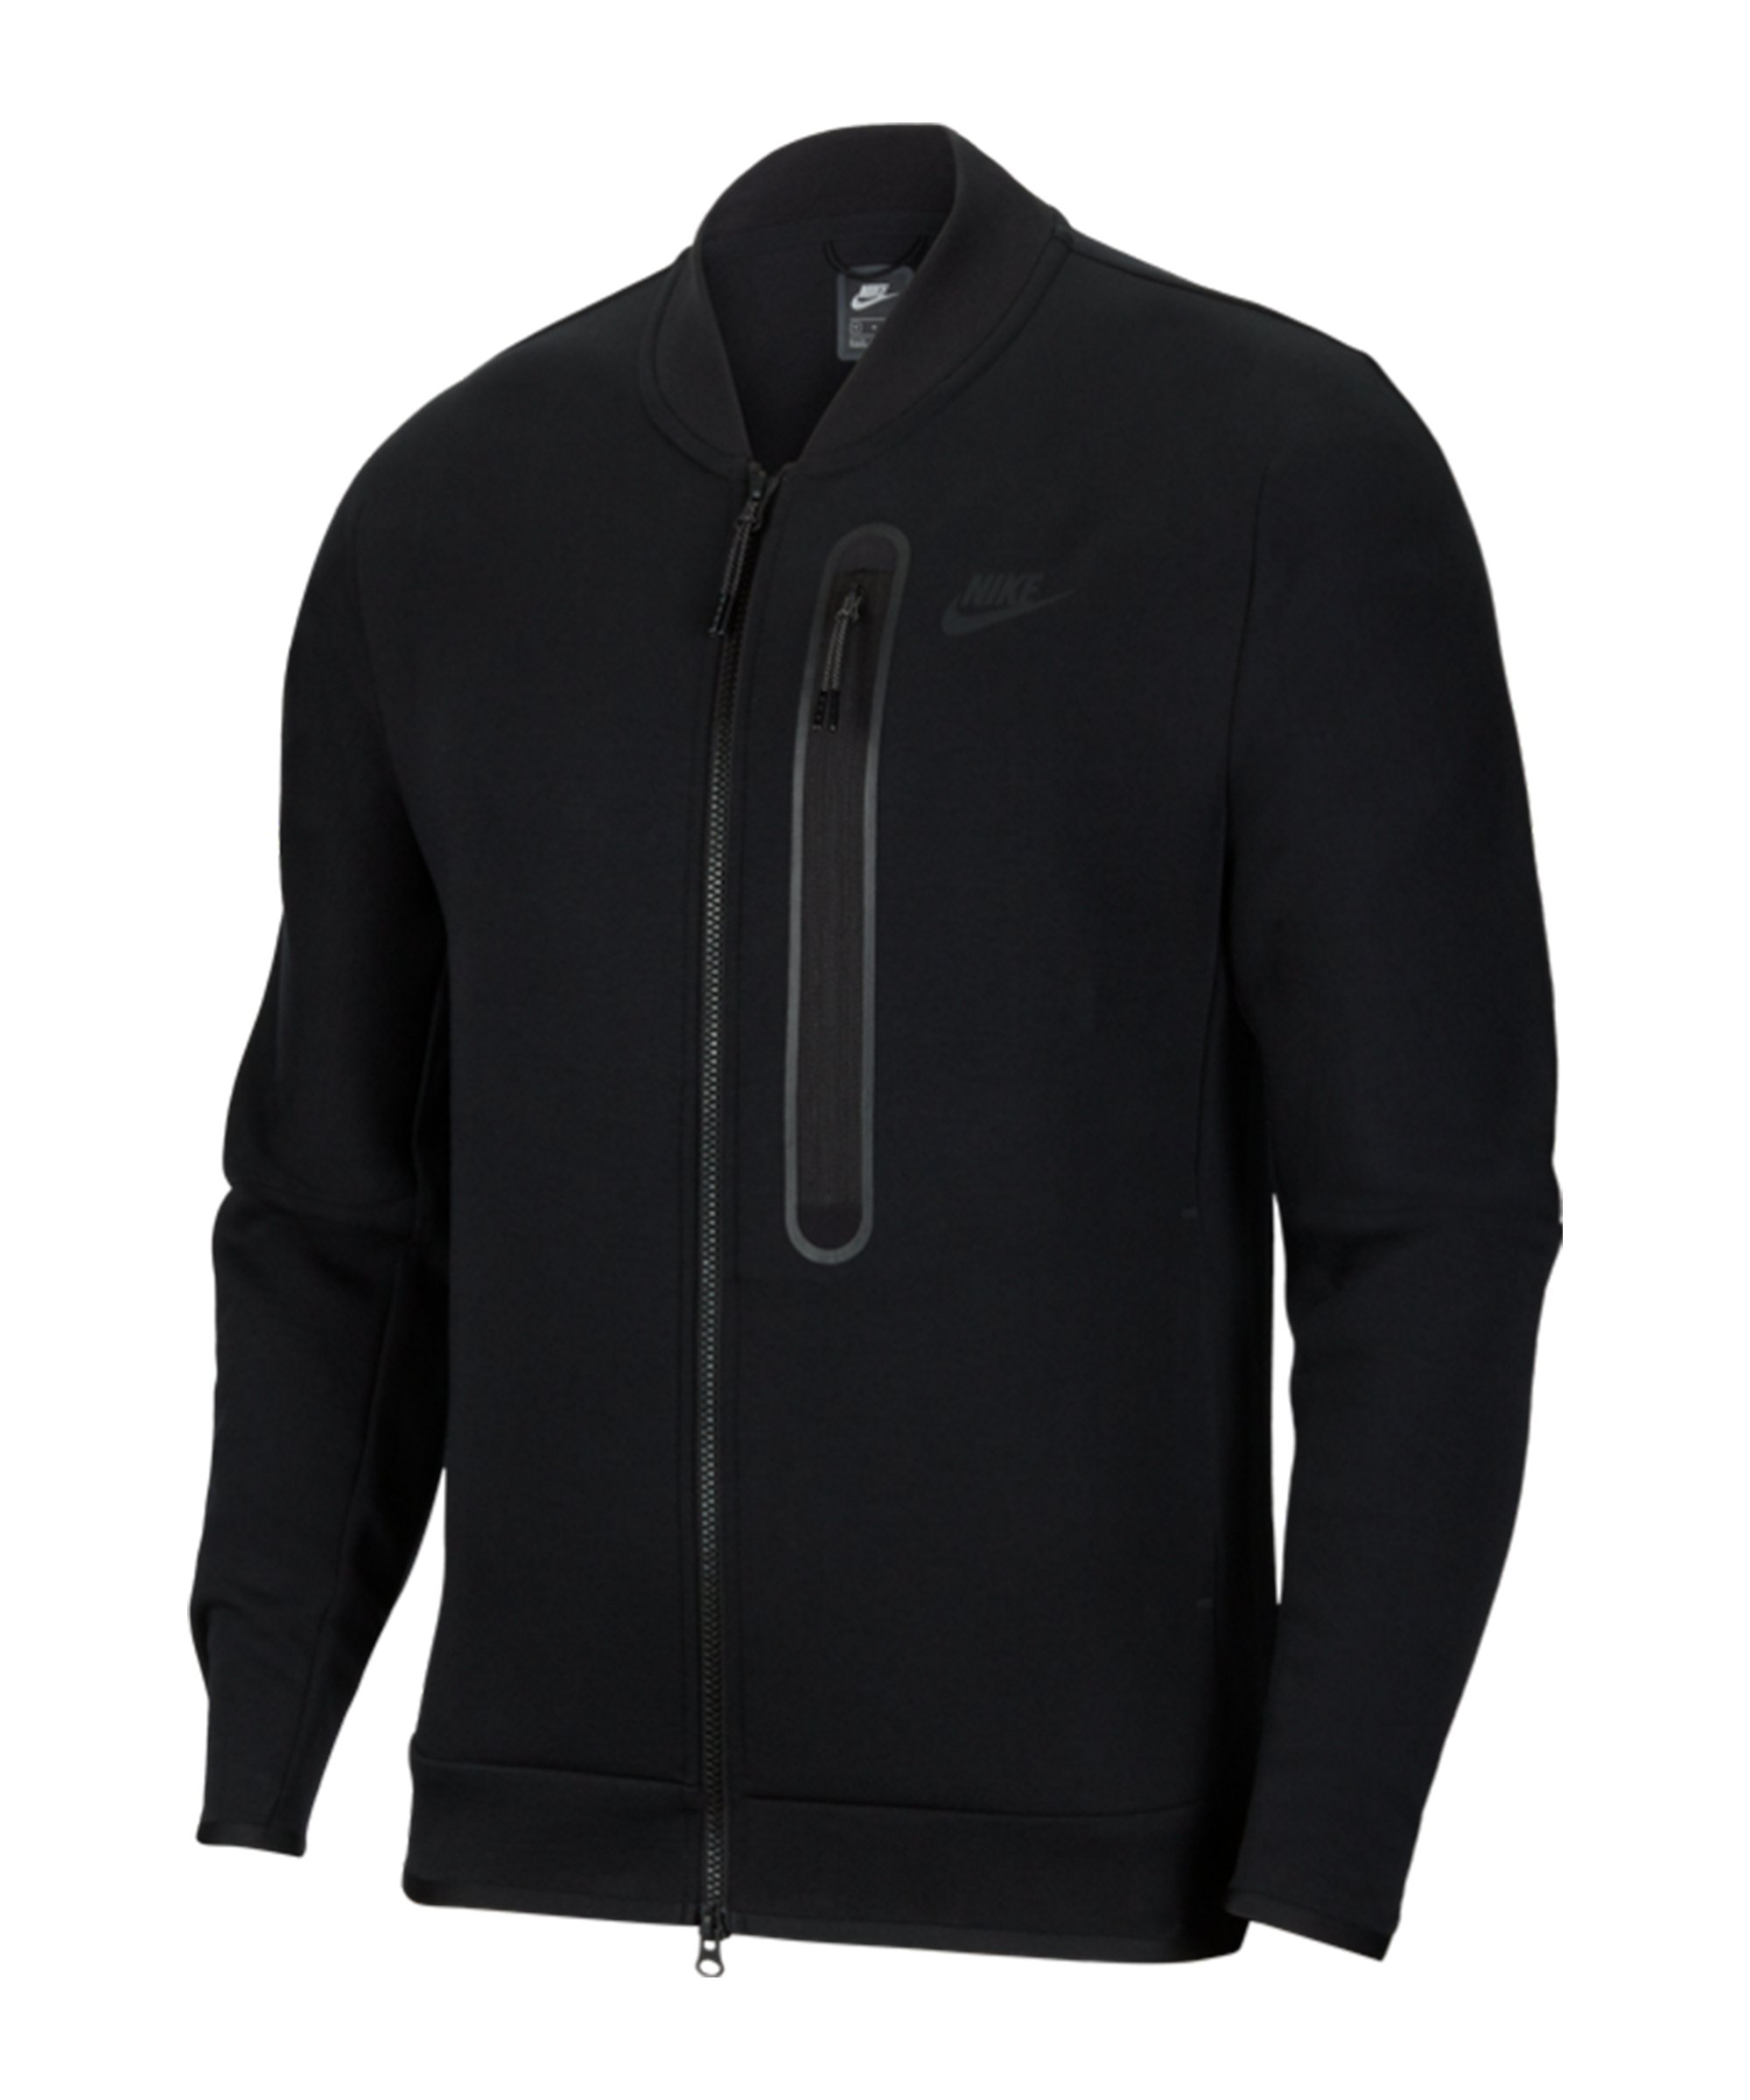 Nike Tech Fleece Bomber Jacke Schwarz F010 - schwarz